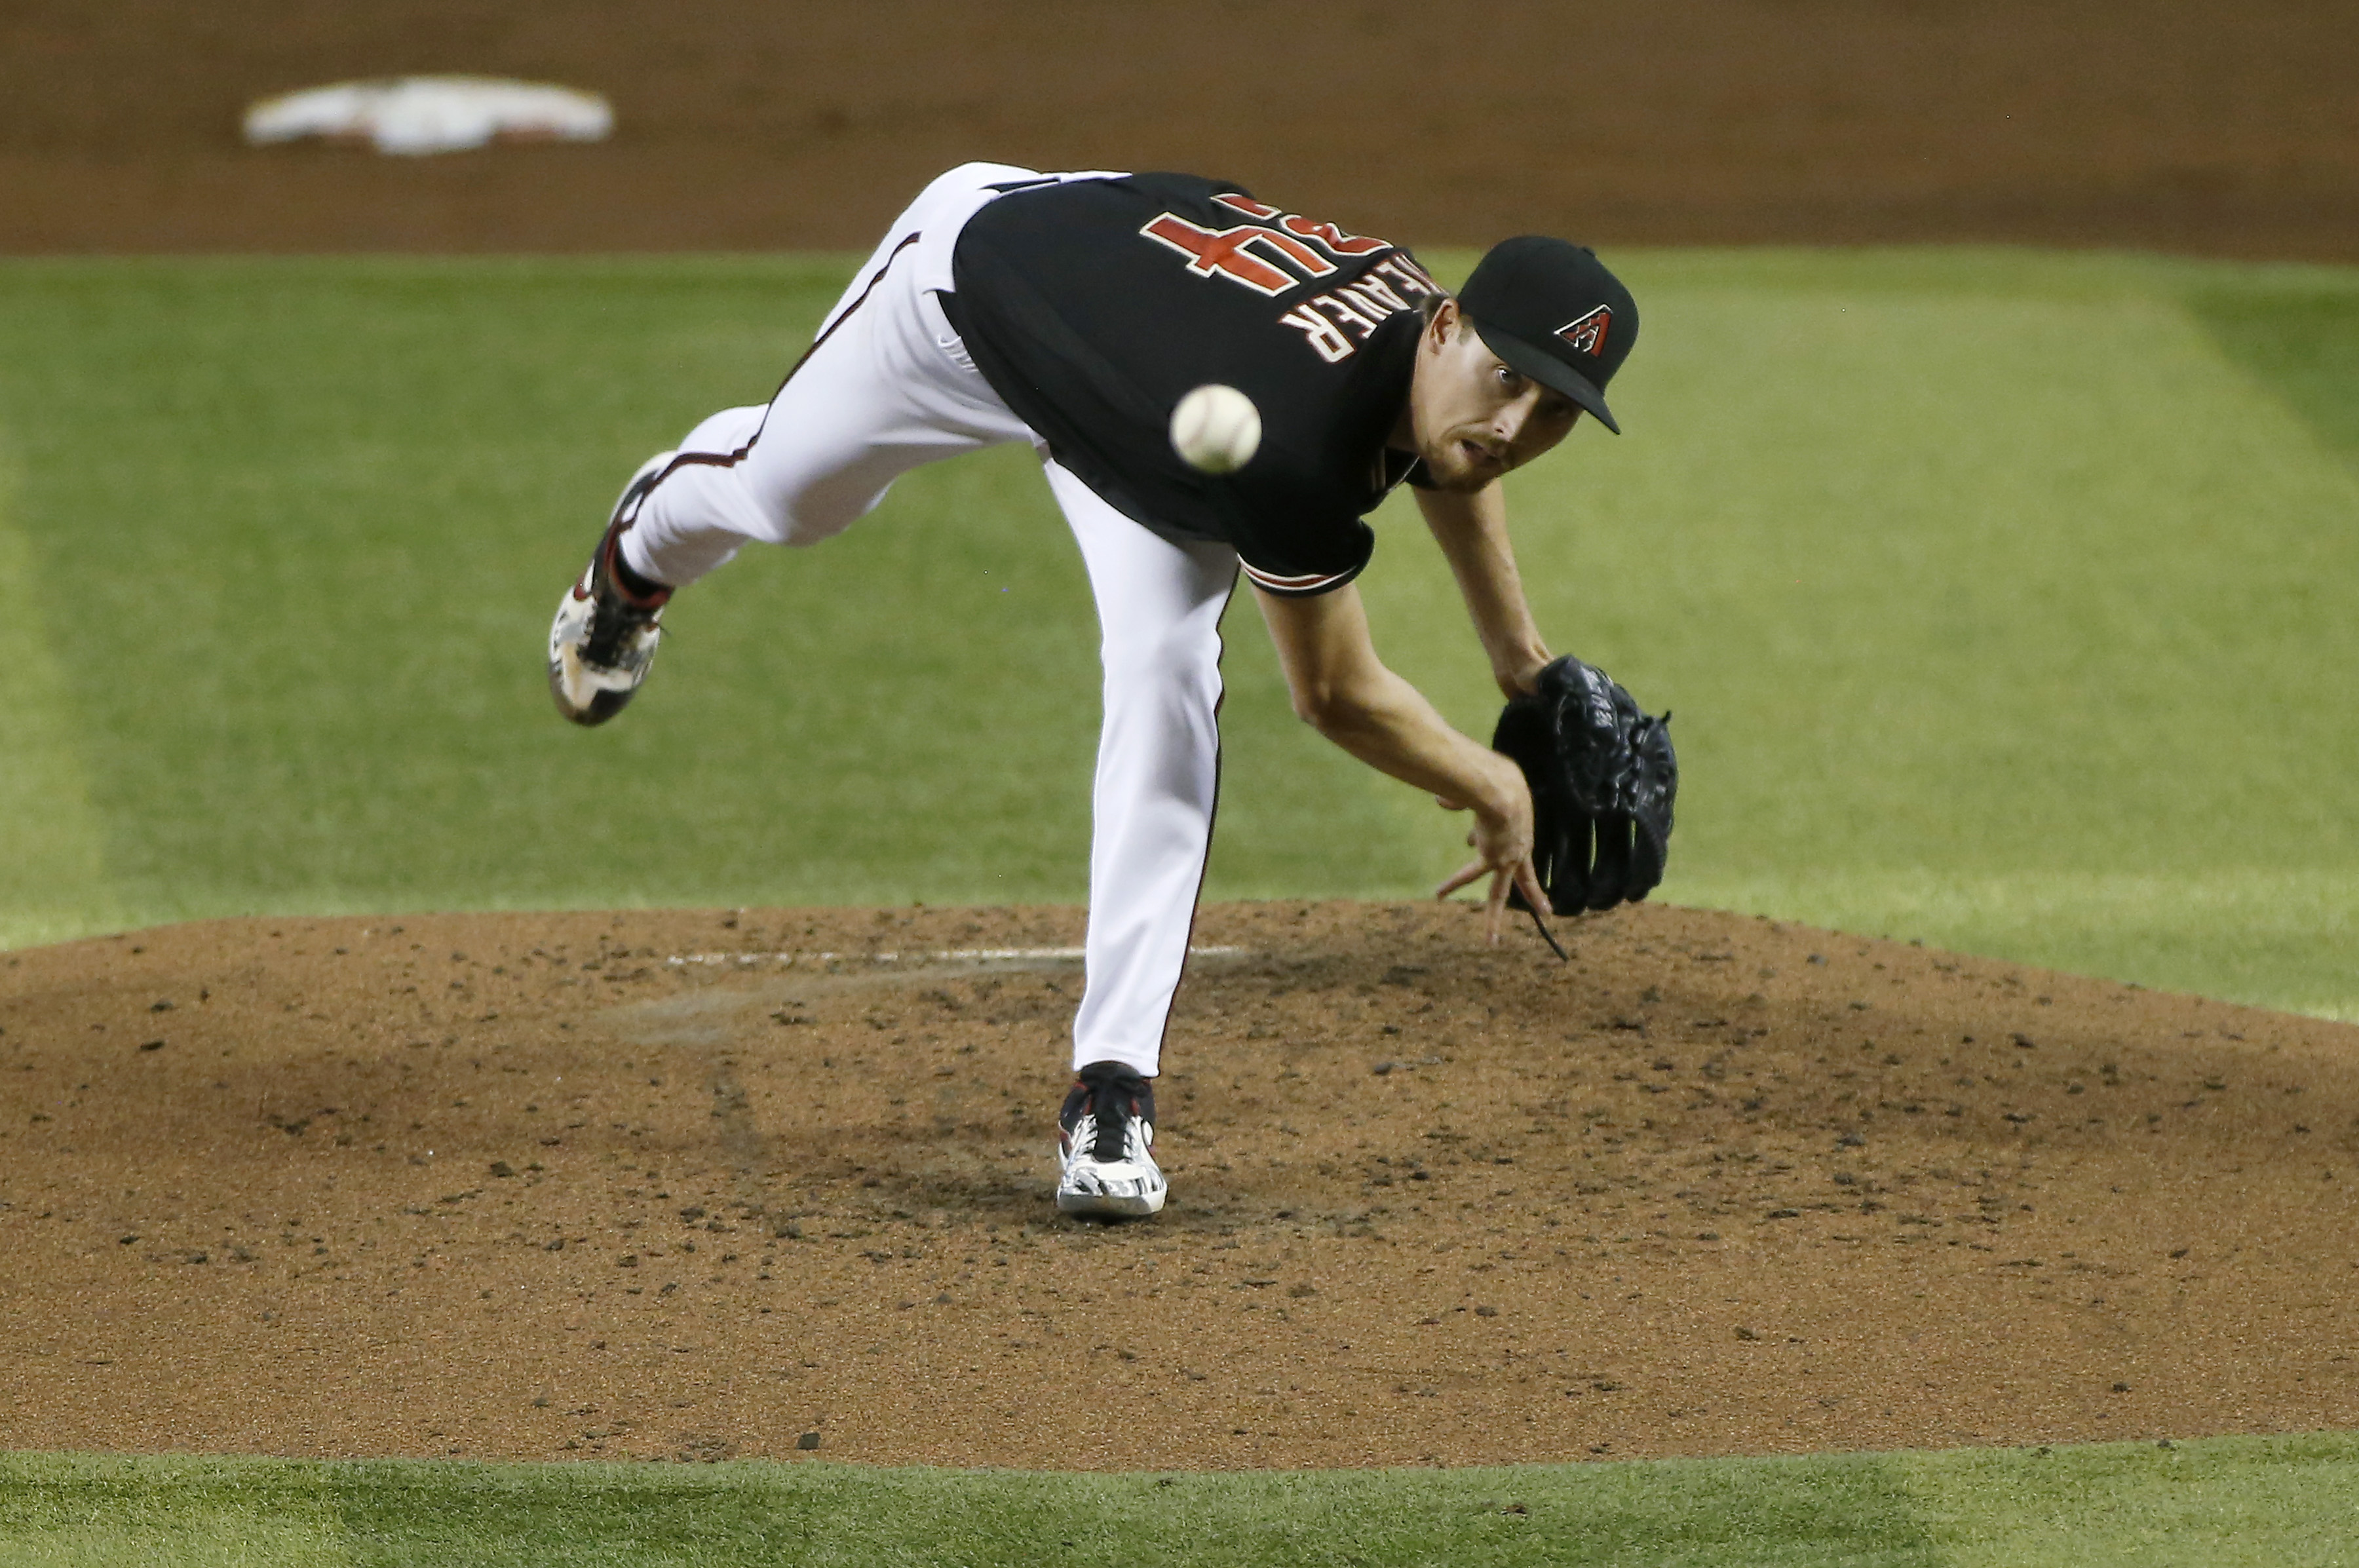 Luke Weaver on the mound.